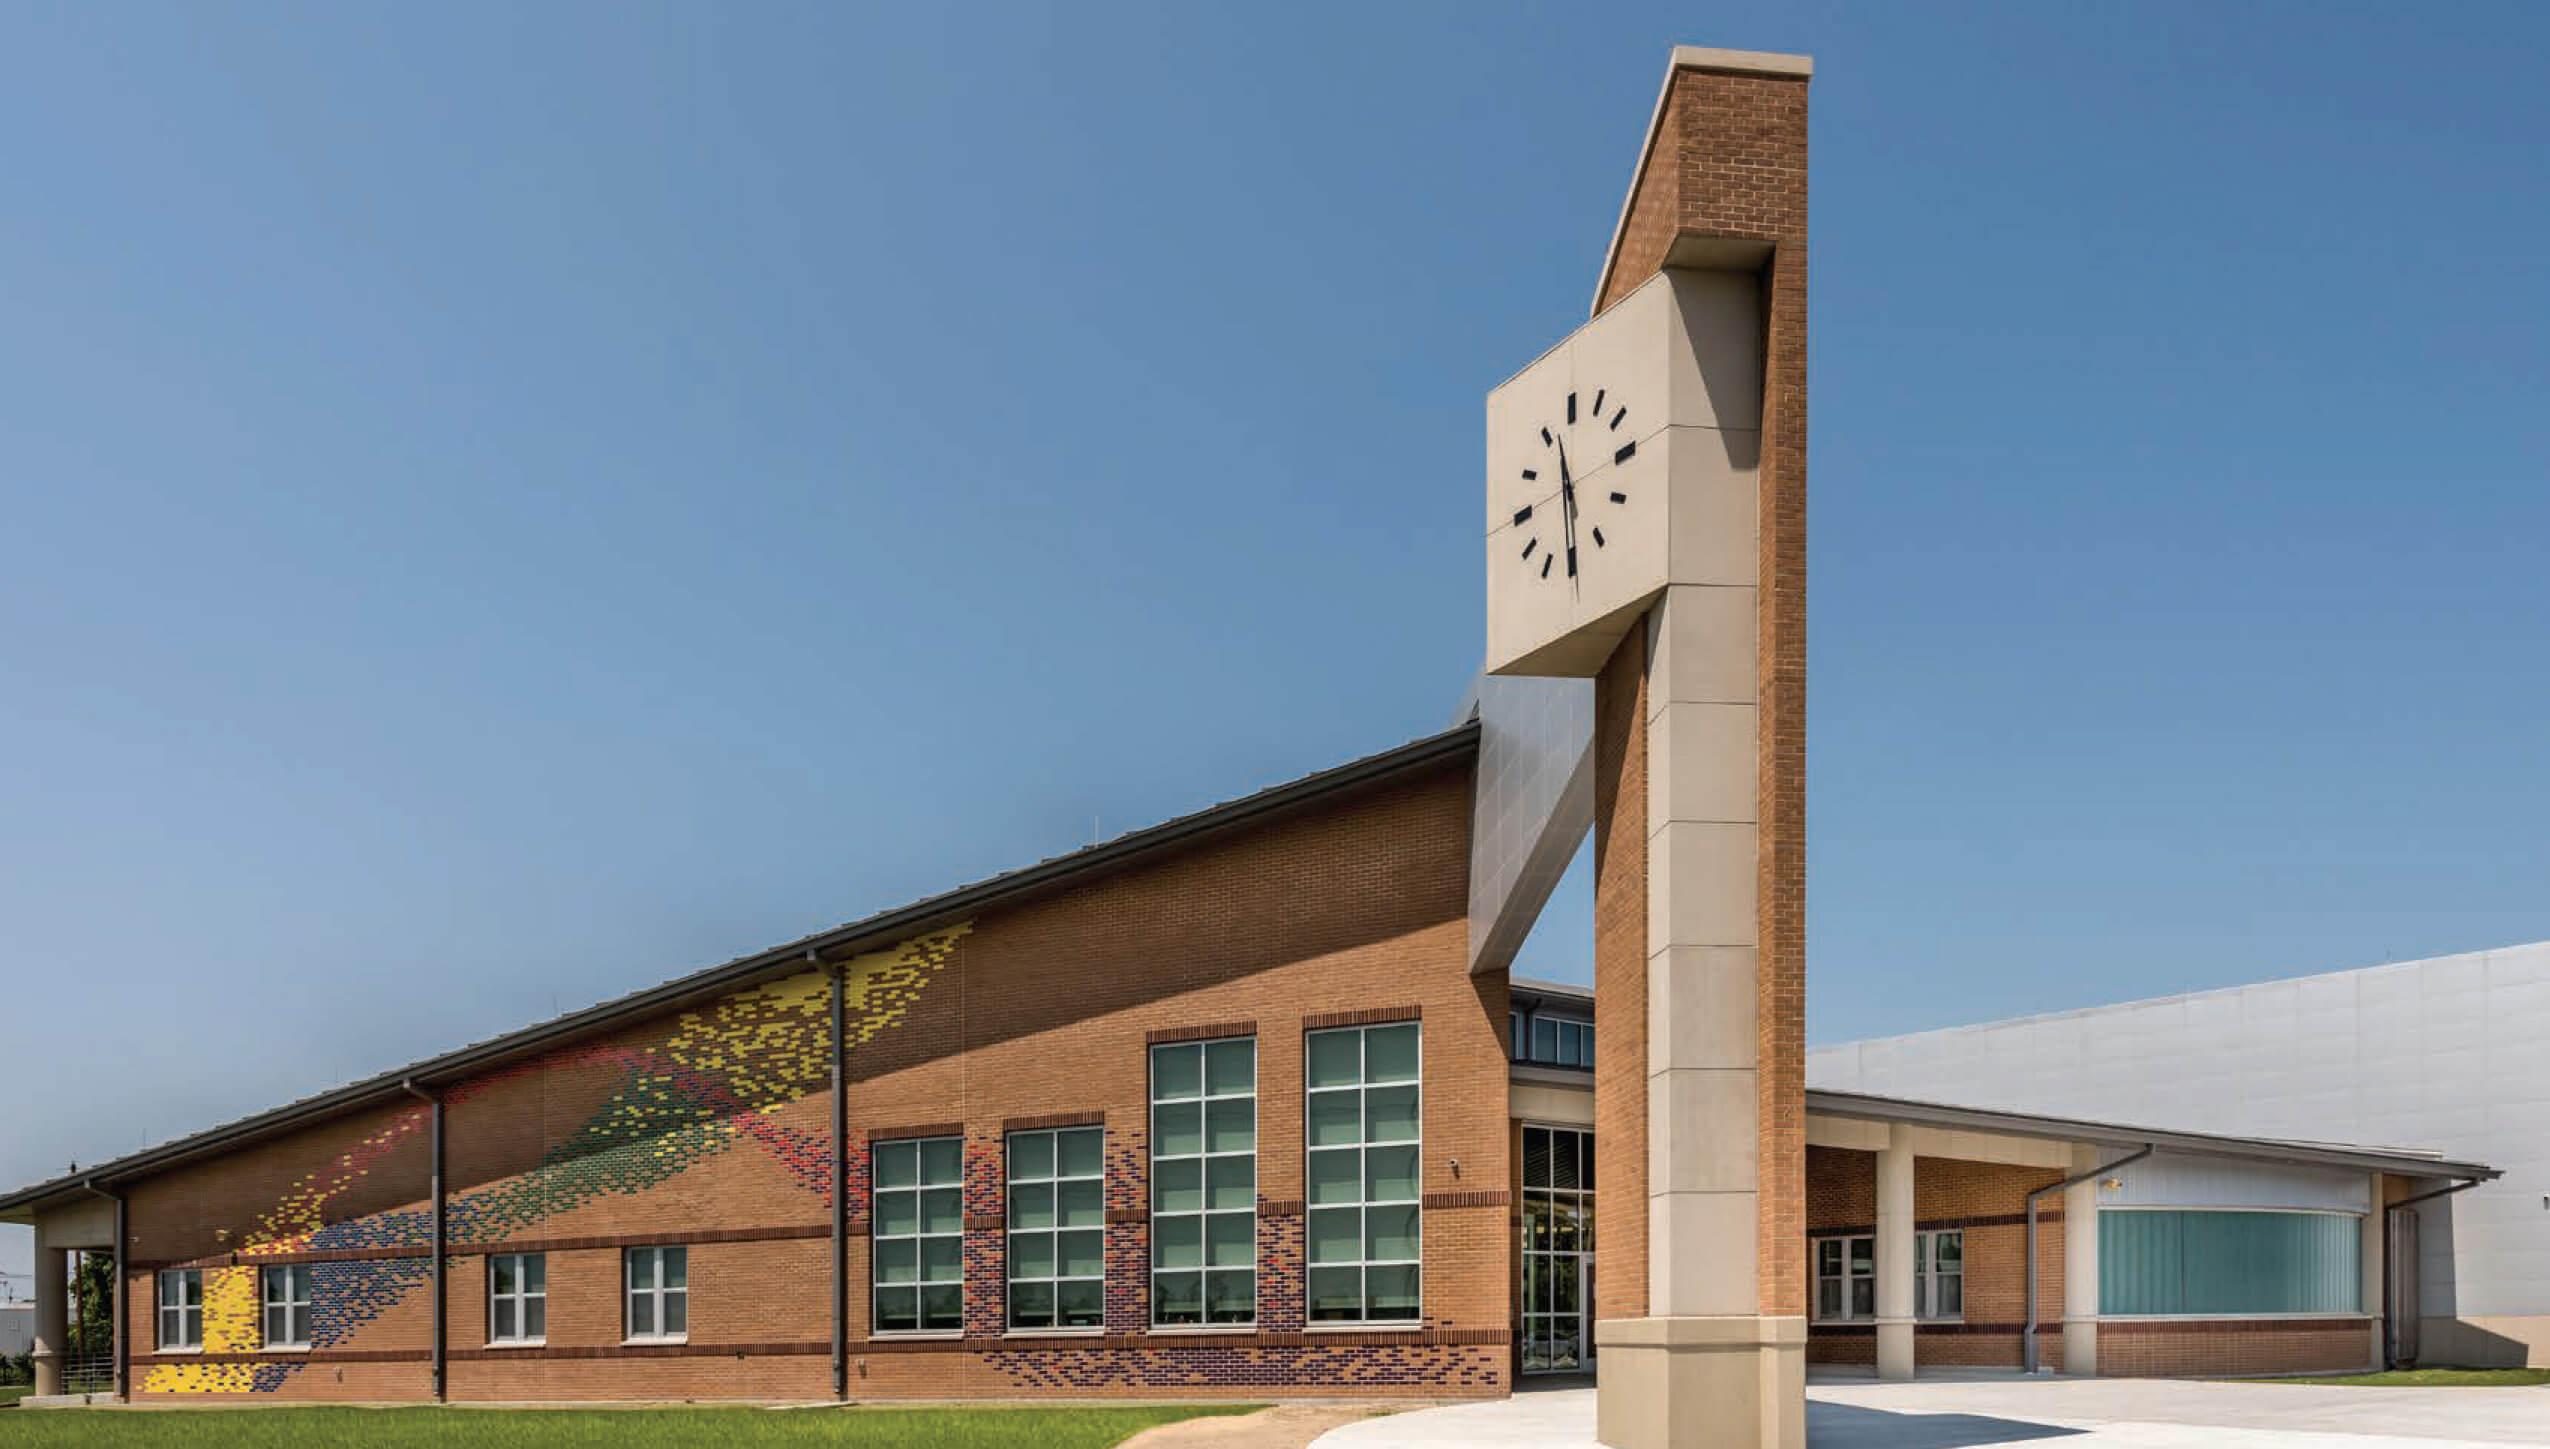 Arlene Meraux Elementary